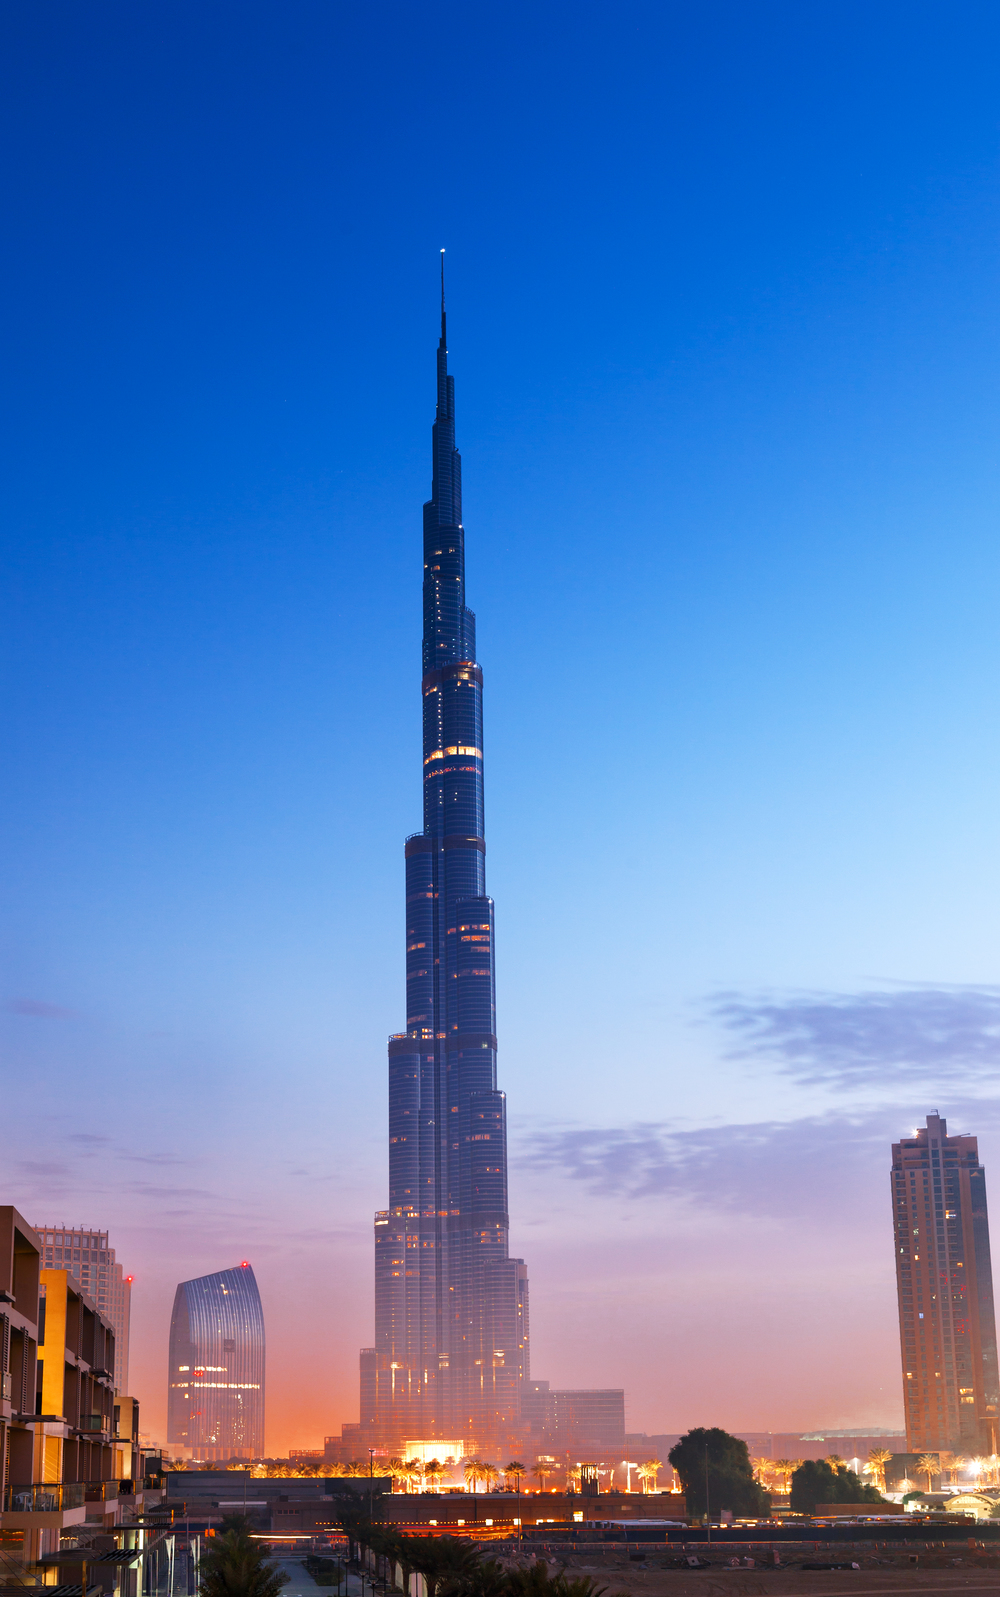 The way of the future? The Burj Khalifa in Dubai